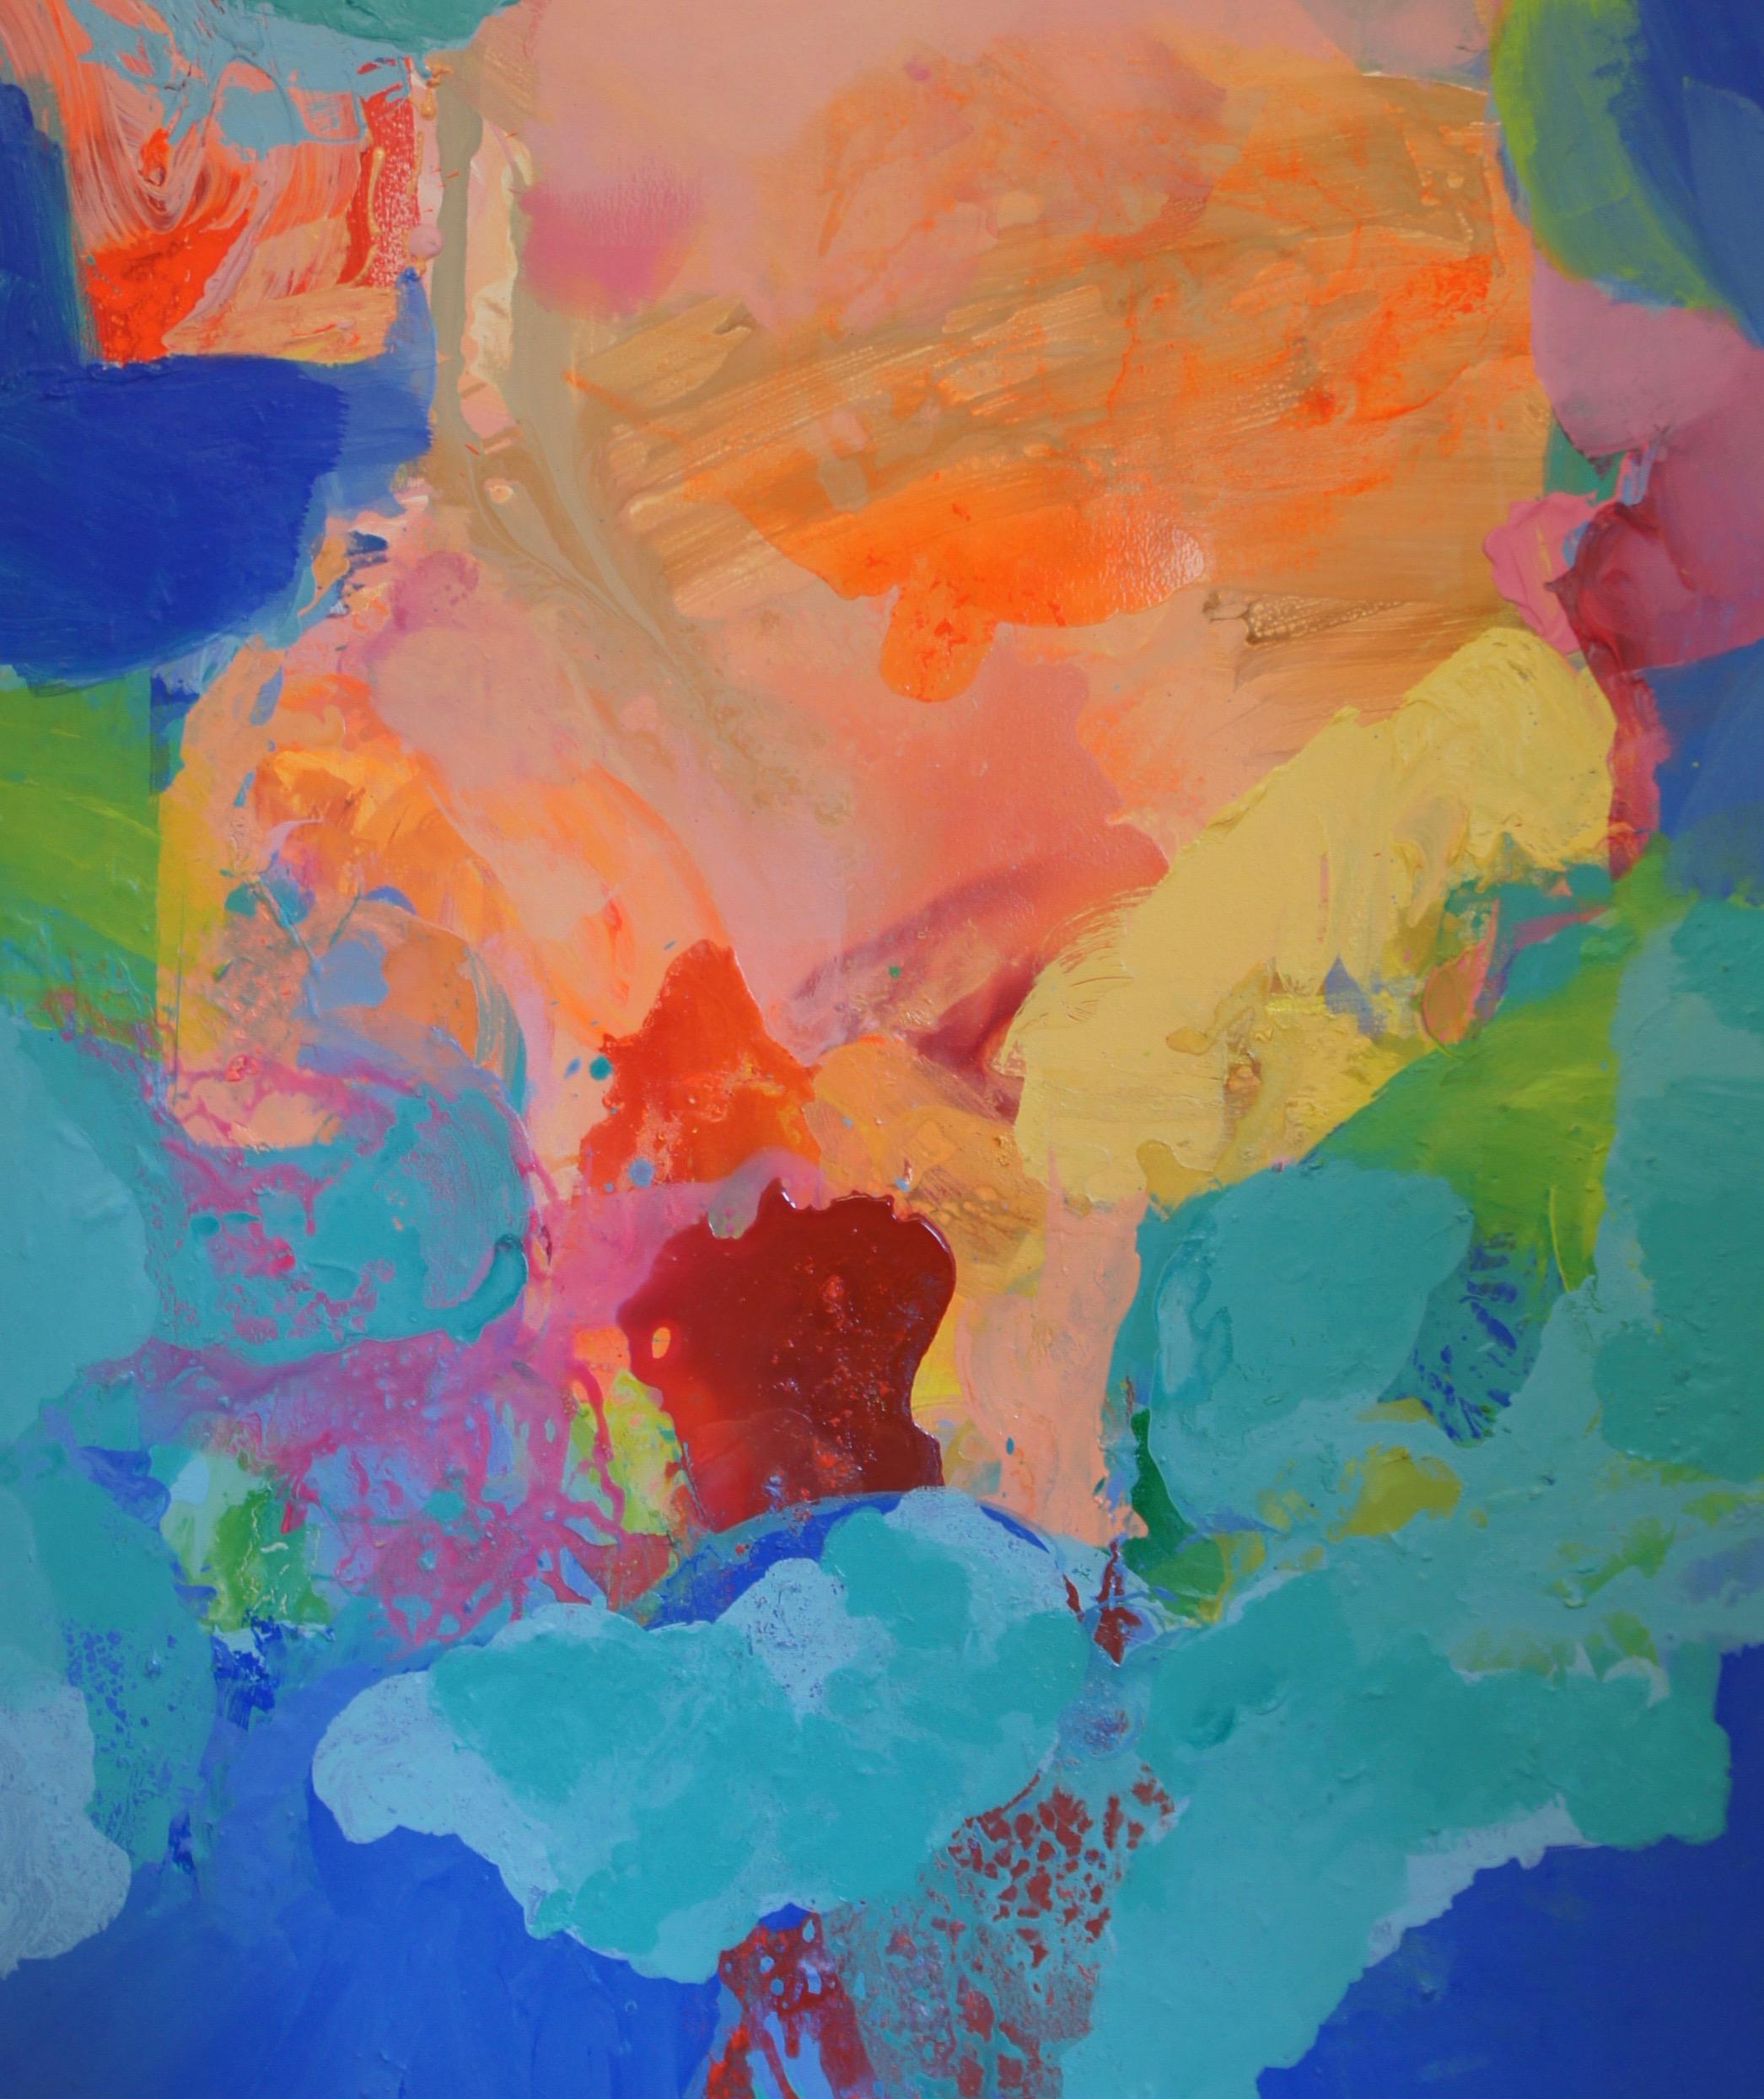 Merja Simberg, Sealed With A Kiss, 2018, ink and acrylic on canvas, 130X110cm JPEG.jpg